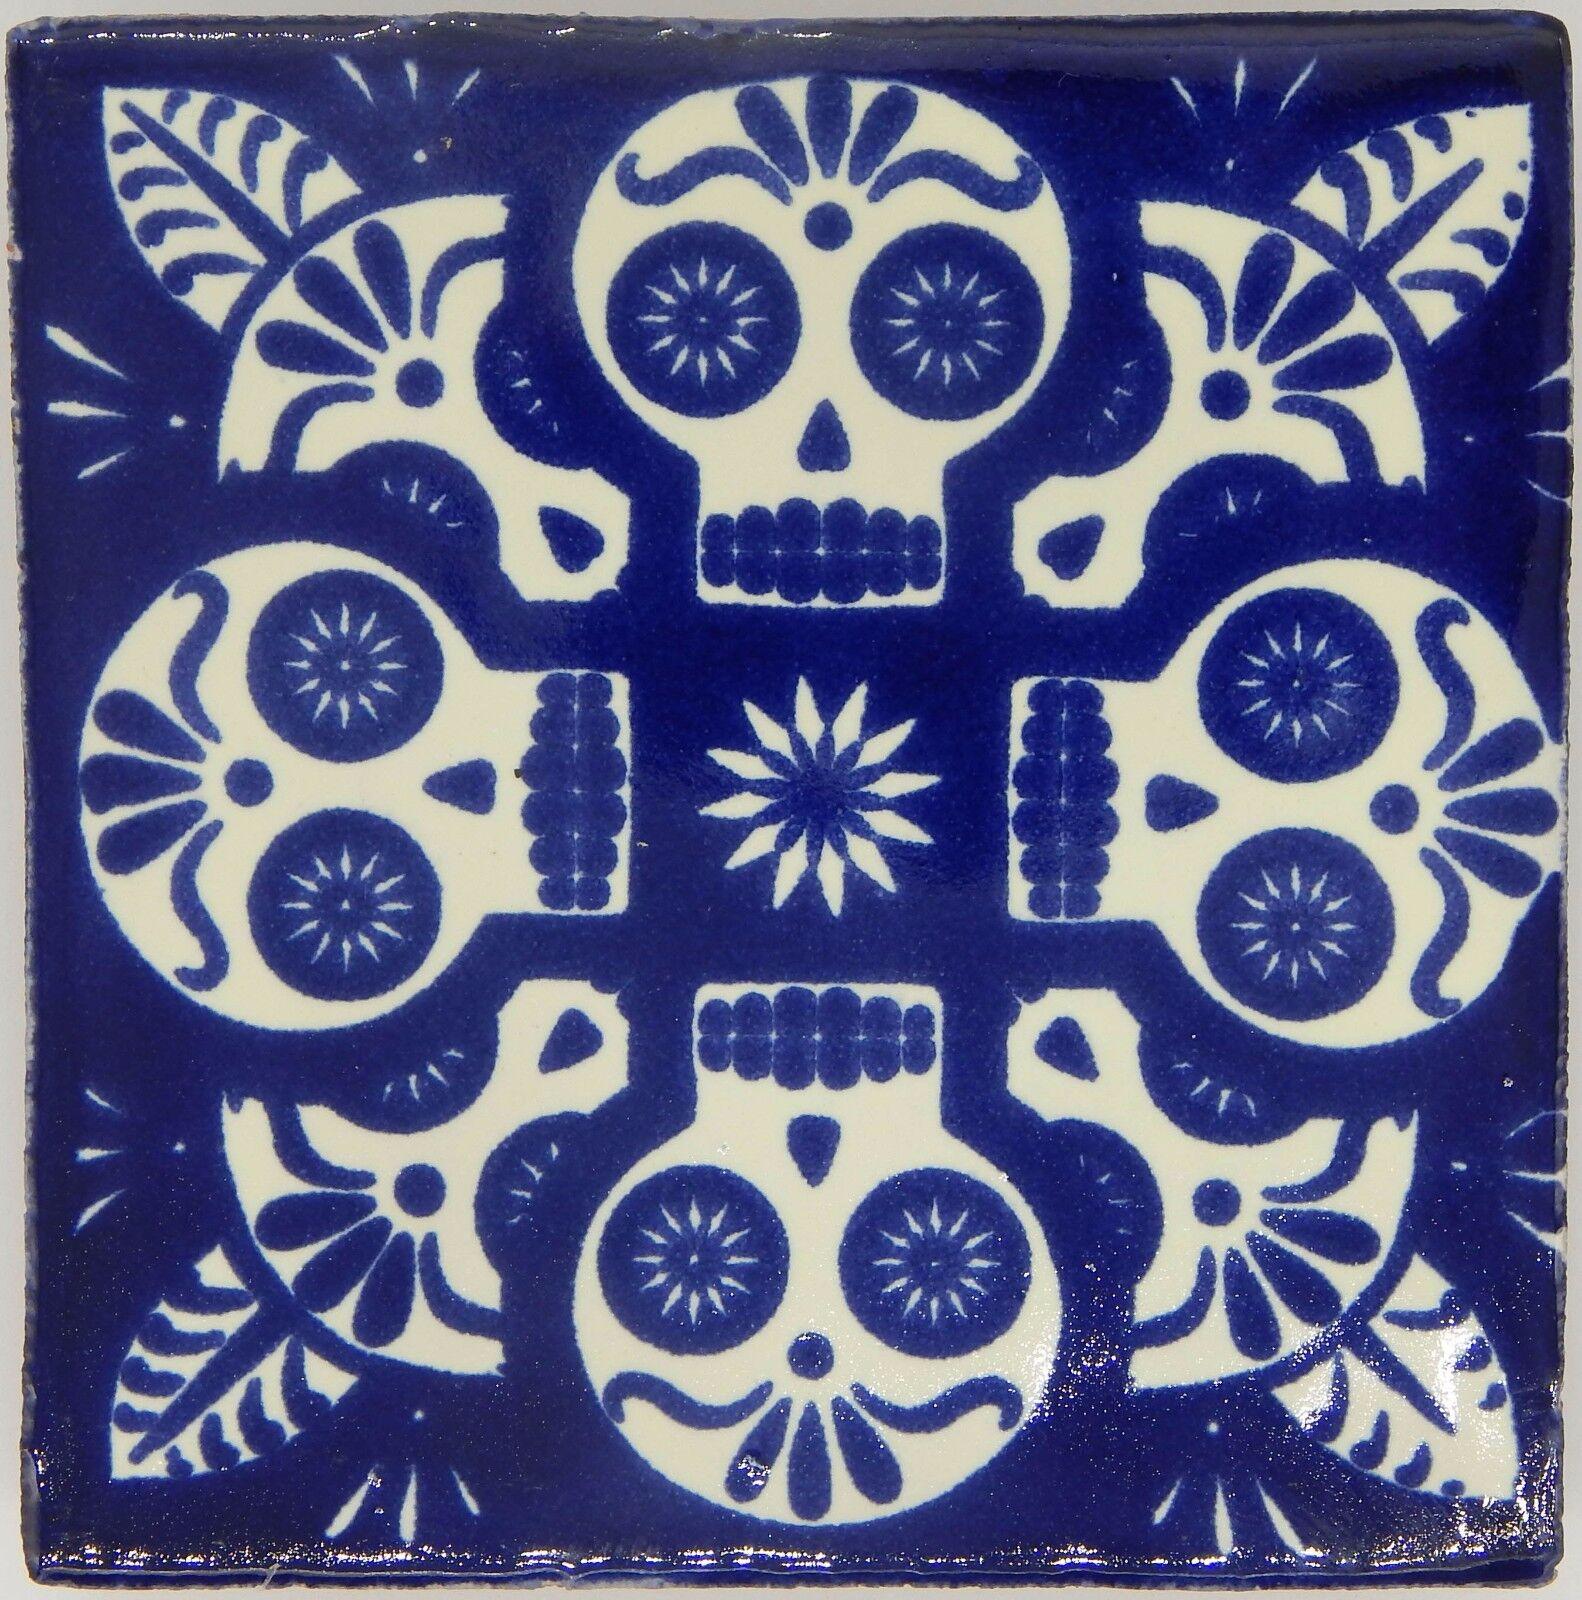 100 Mexican Talavera tiles 4x4 Decorative Folk Art Handmade C395